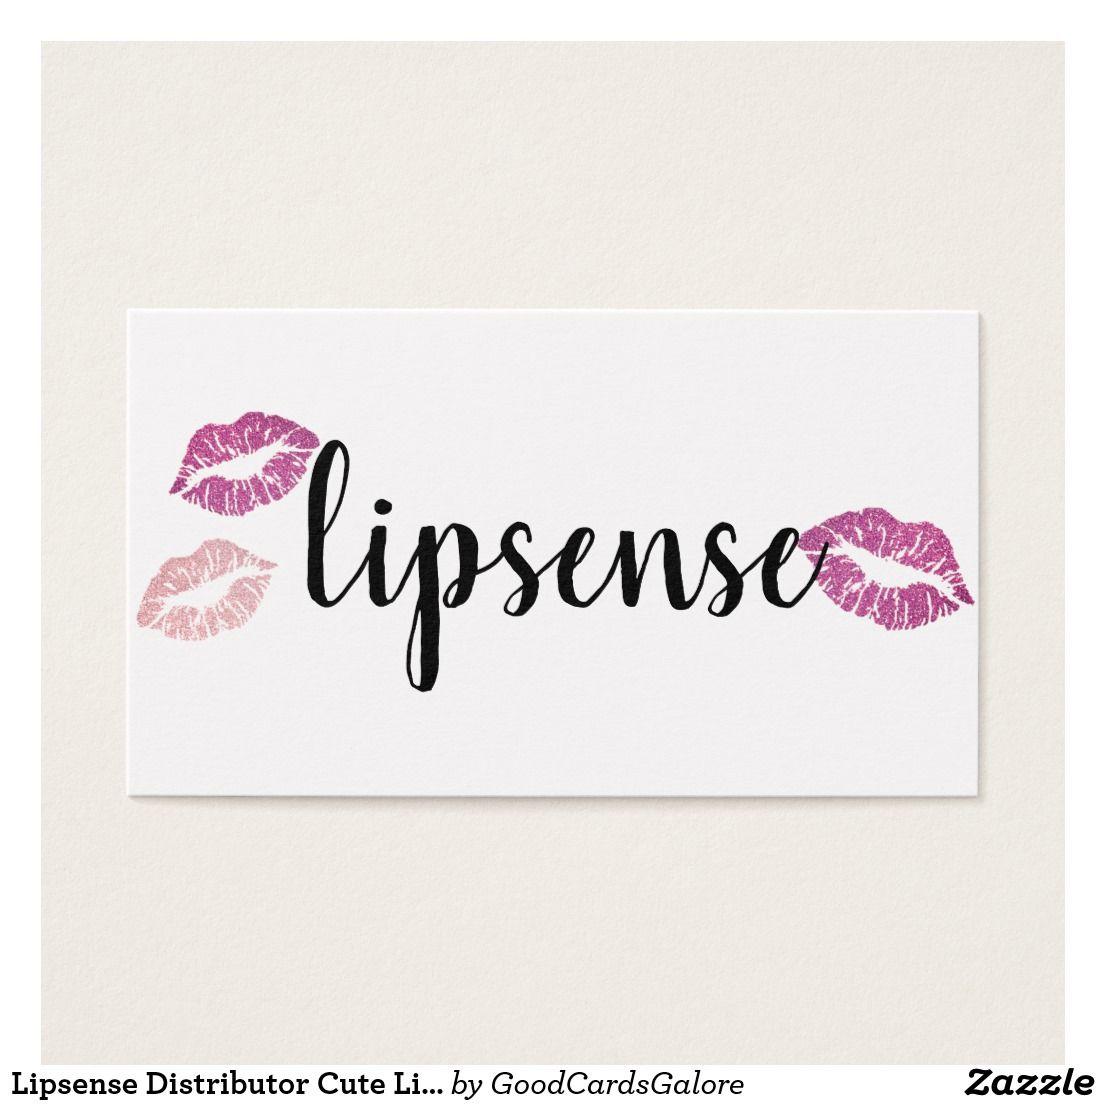 Lipsense Distributor Cute Lips Business Cards